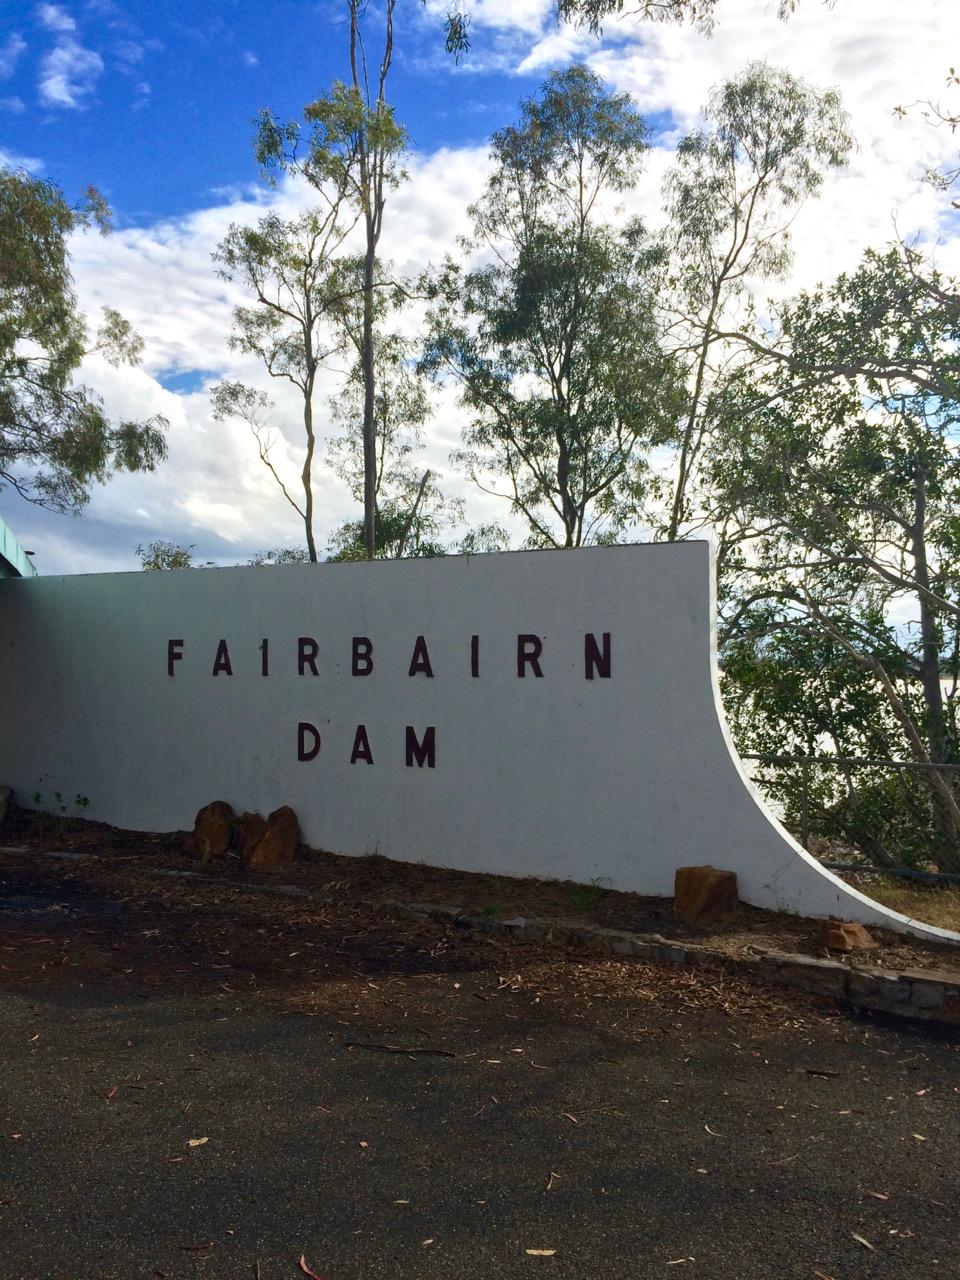 Fairbairn Dam, Emerald, QLD